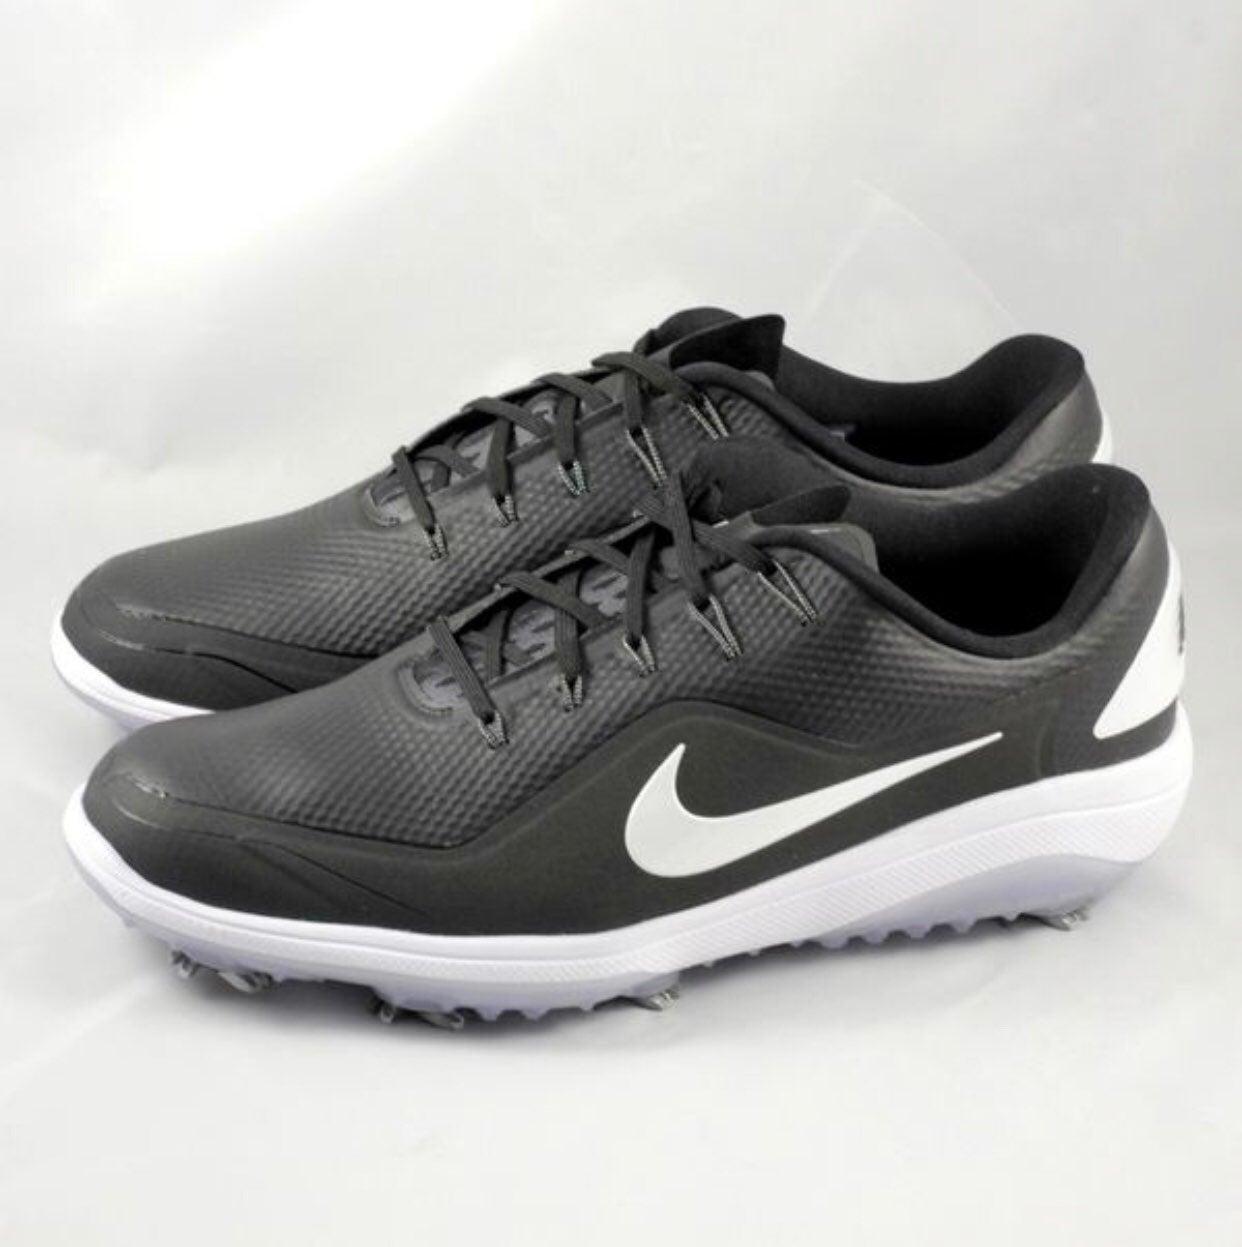 Nike React Vapor 2 Mens Golf Shoes